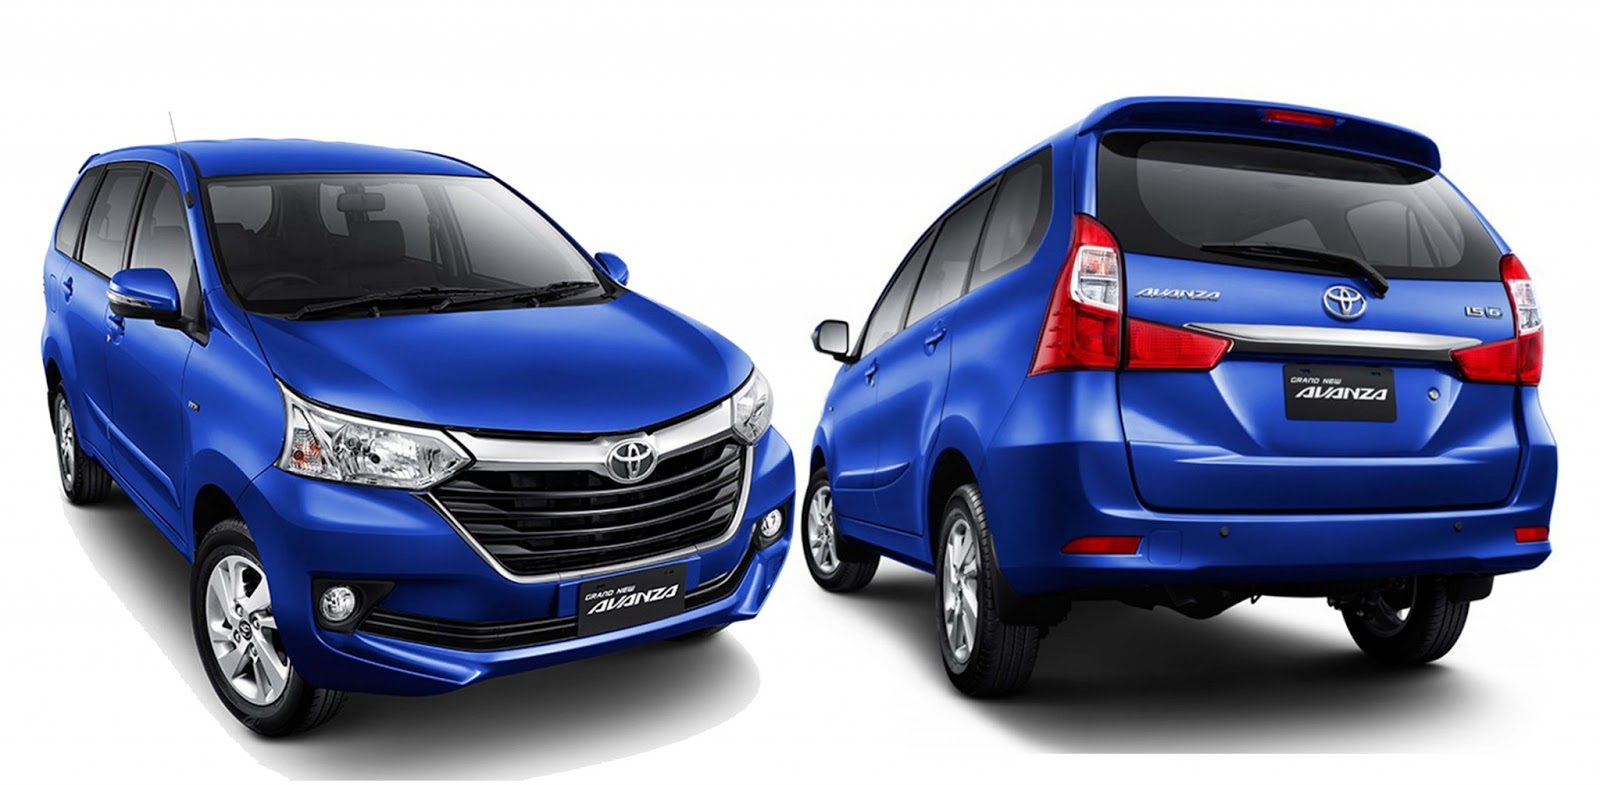 Indikator Grand New Avanza Modif Kredit Mobil Toyota Bandung Info 0812 2248 1100